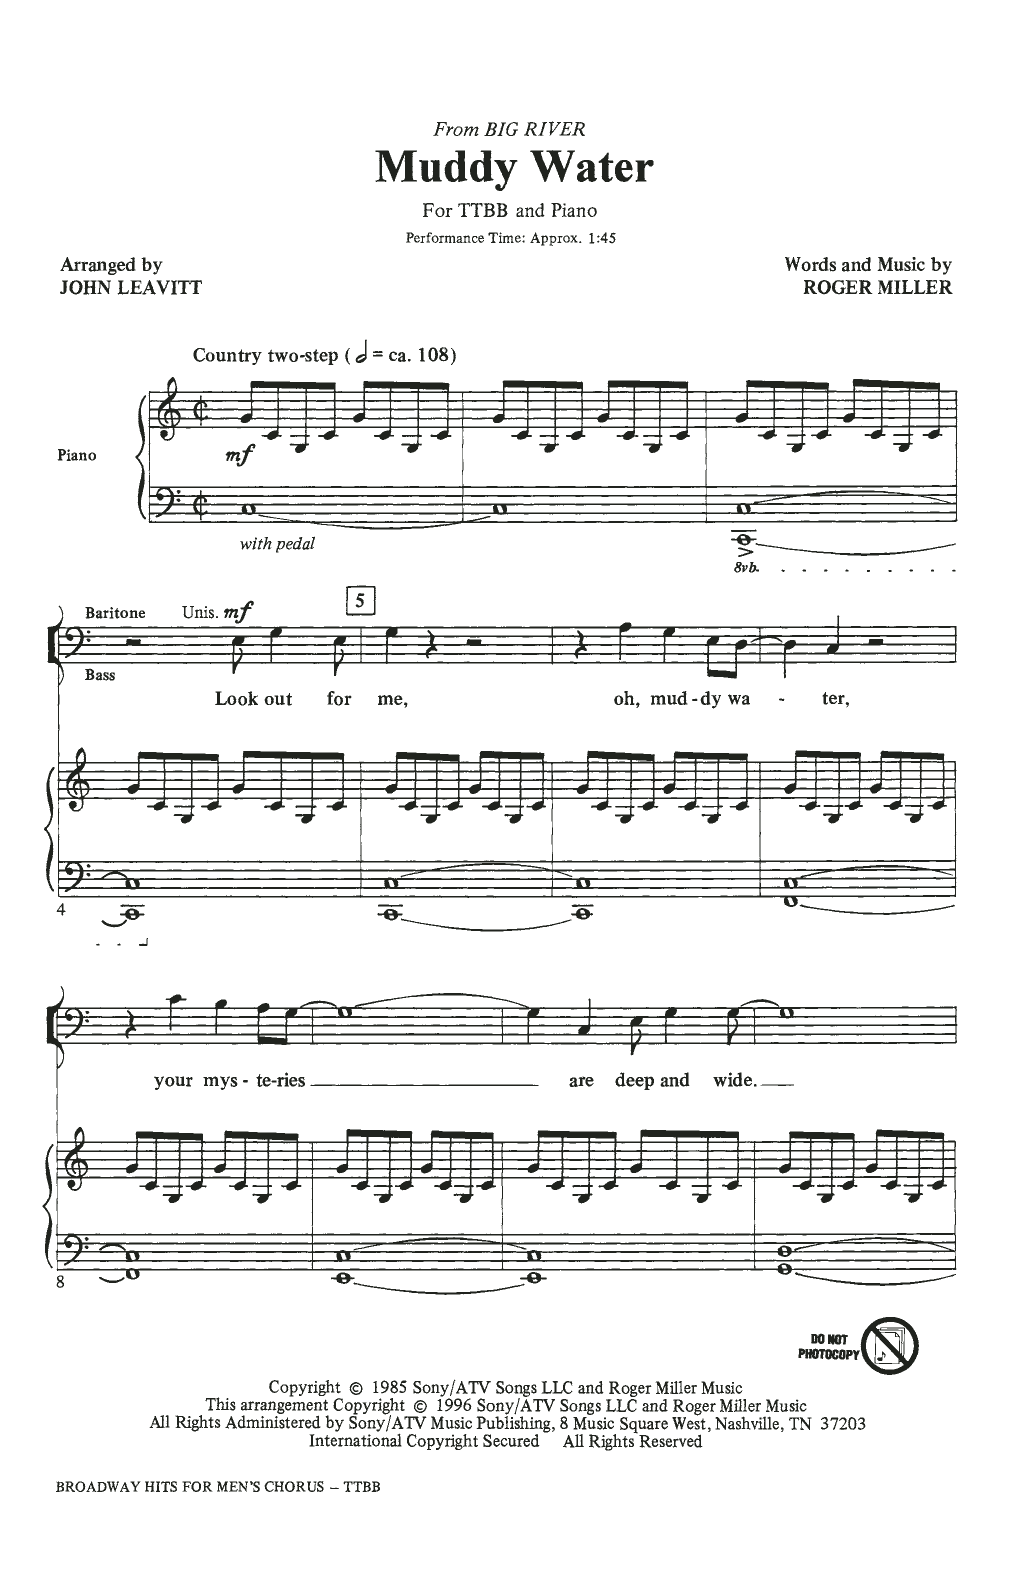 Broadway Hits For Men's Chorus (TTBB Choir)